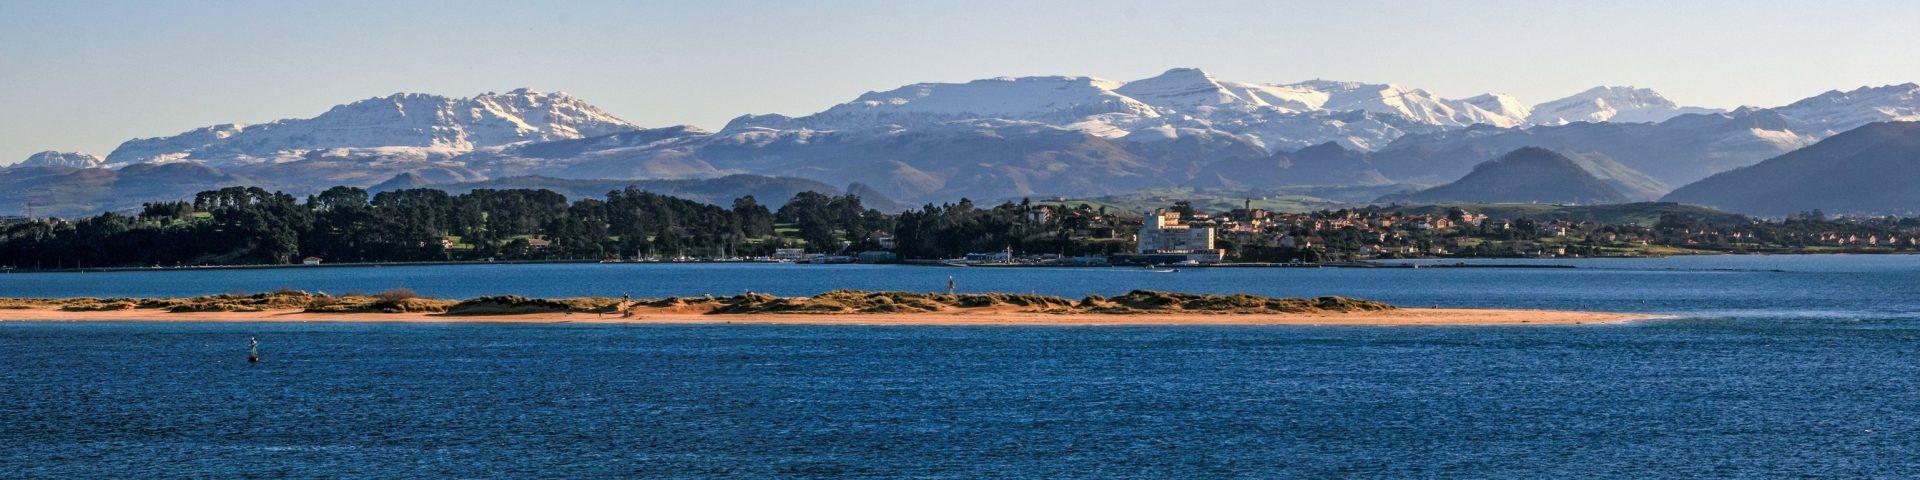 Playa del Puntal Santander